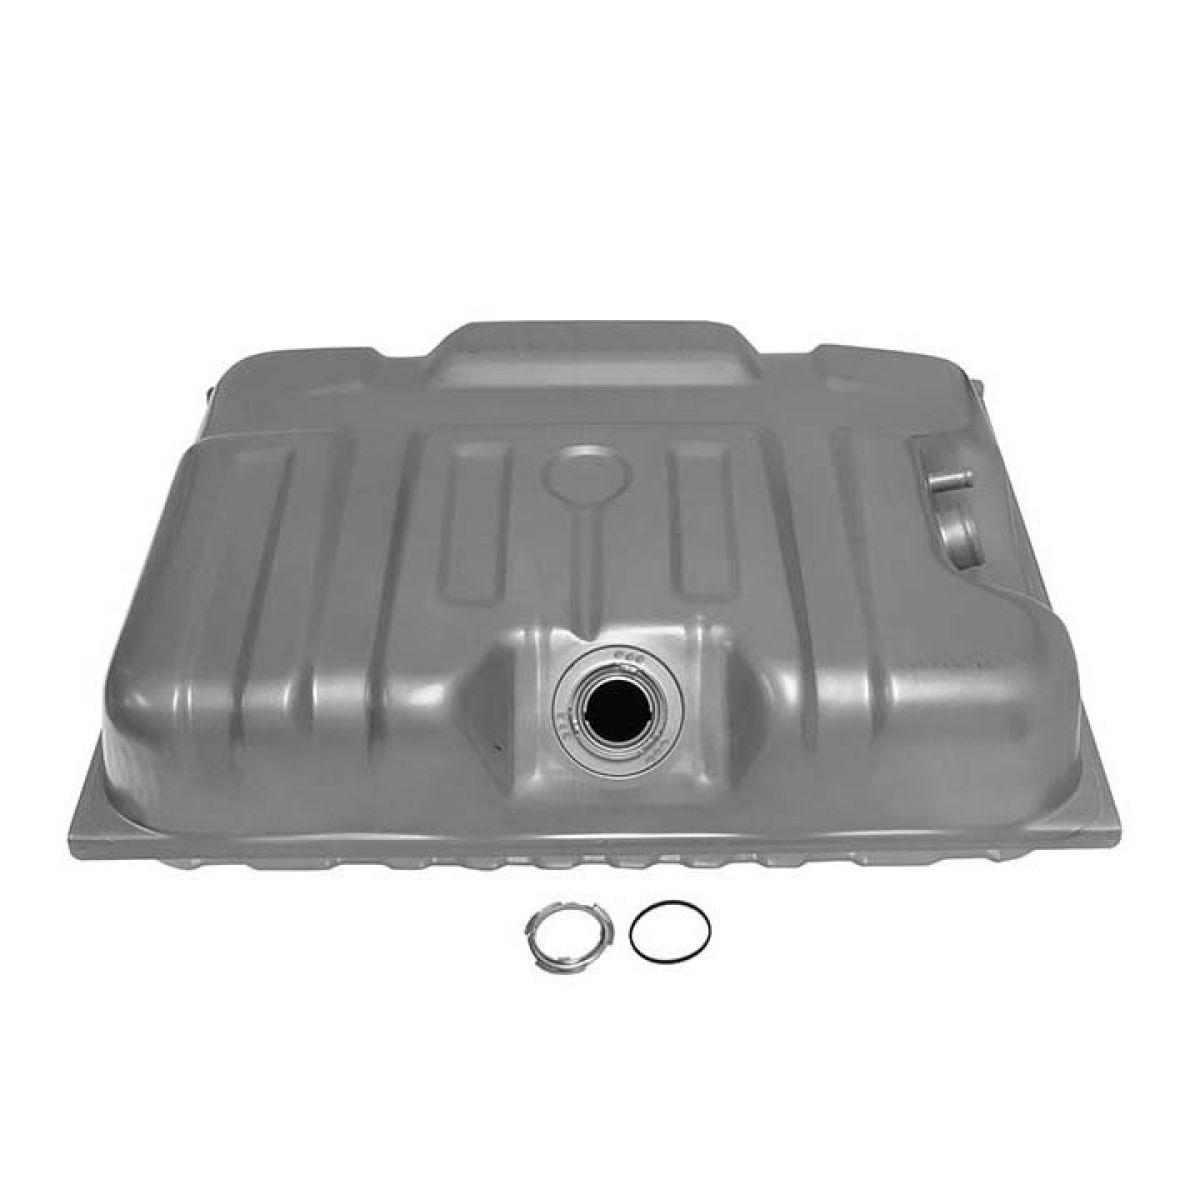 gas fuel tank 19 gallon rear mount for 73 78 ford f100 f150 f250 f350 ebay. Black Bedroom Furniture Sets. Home Design Ideas